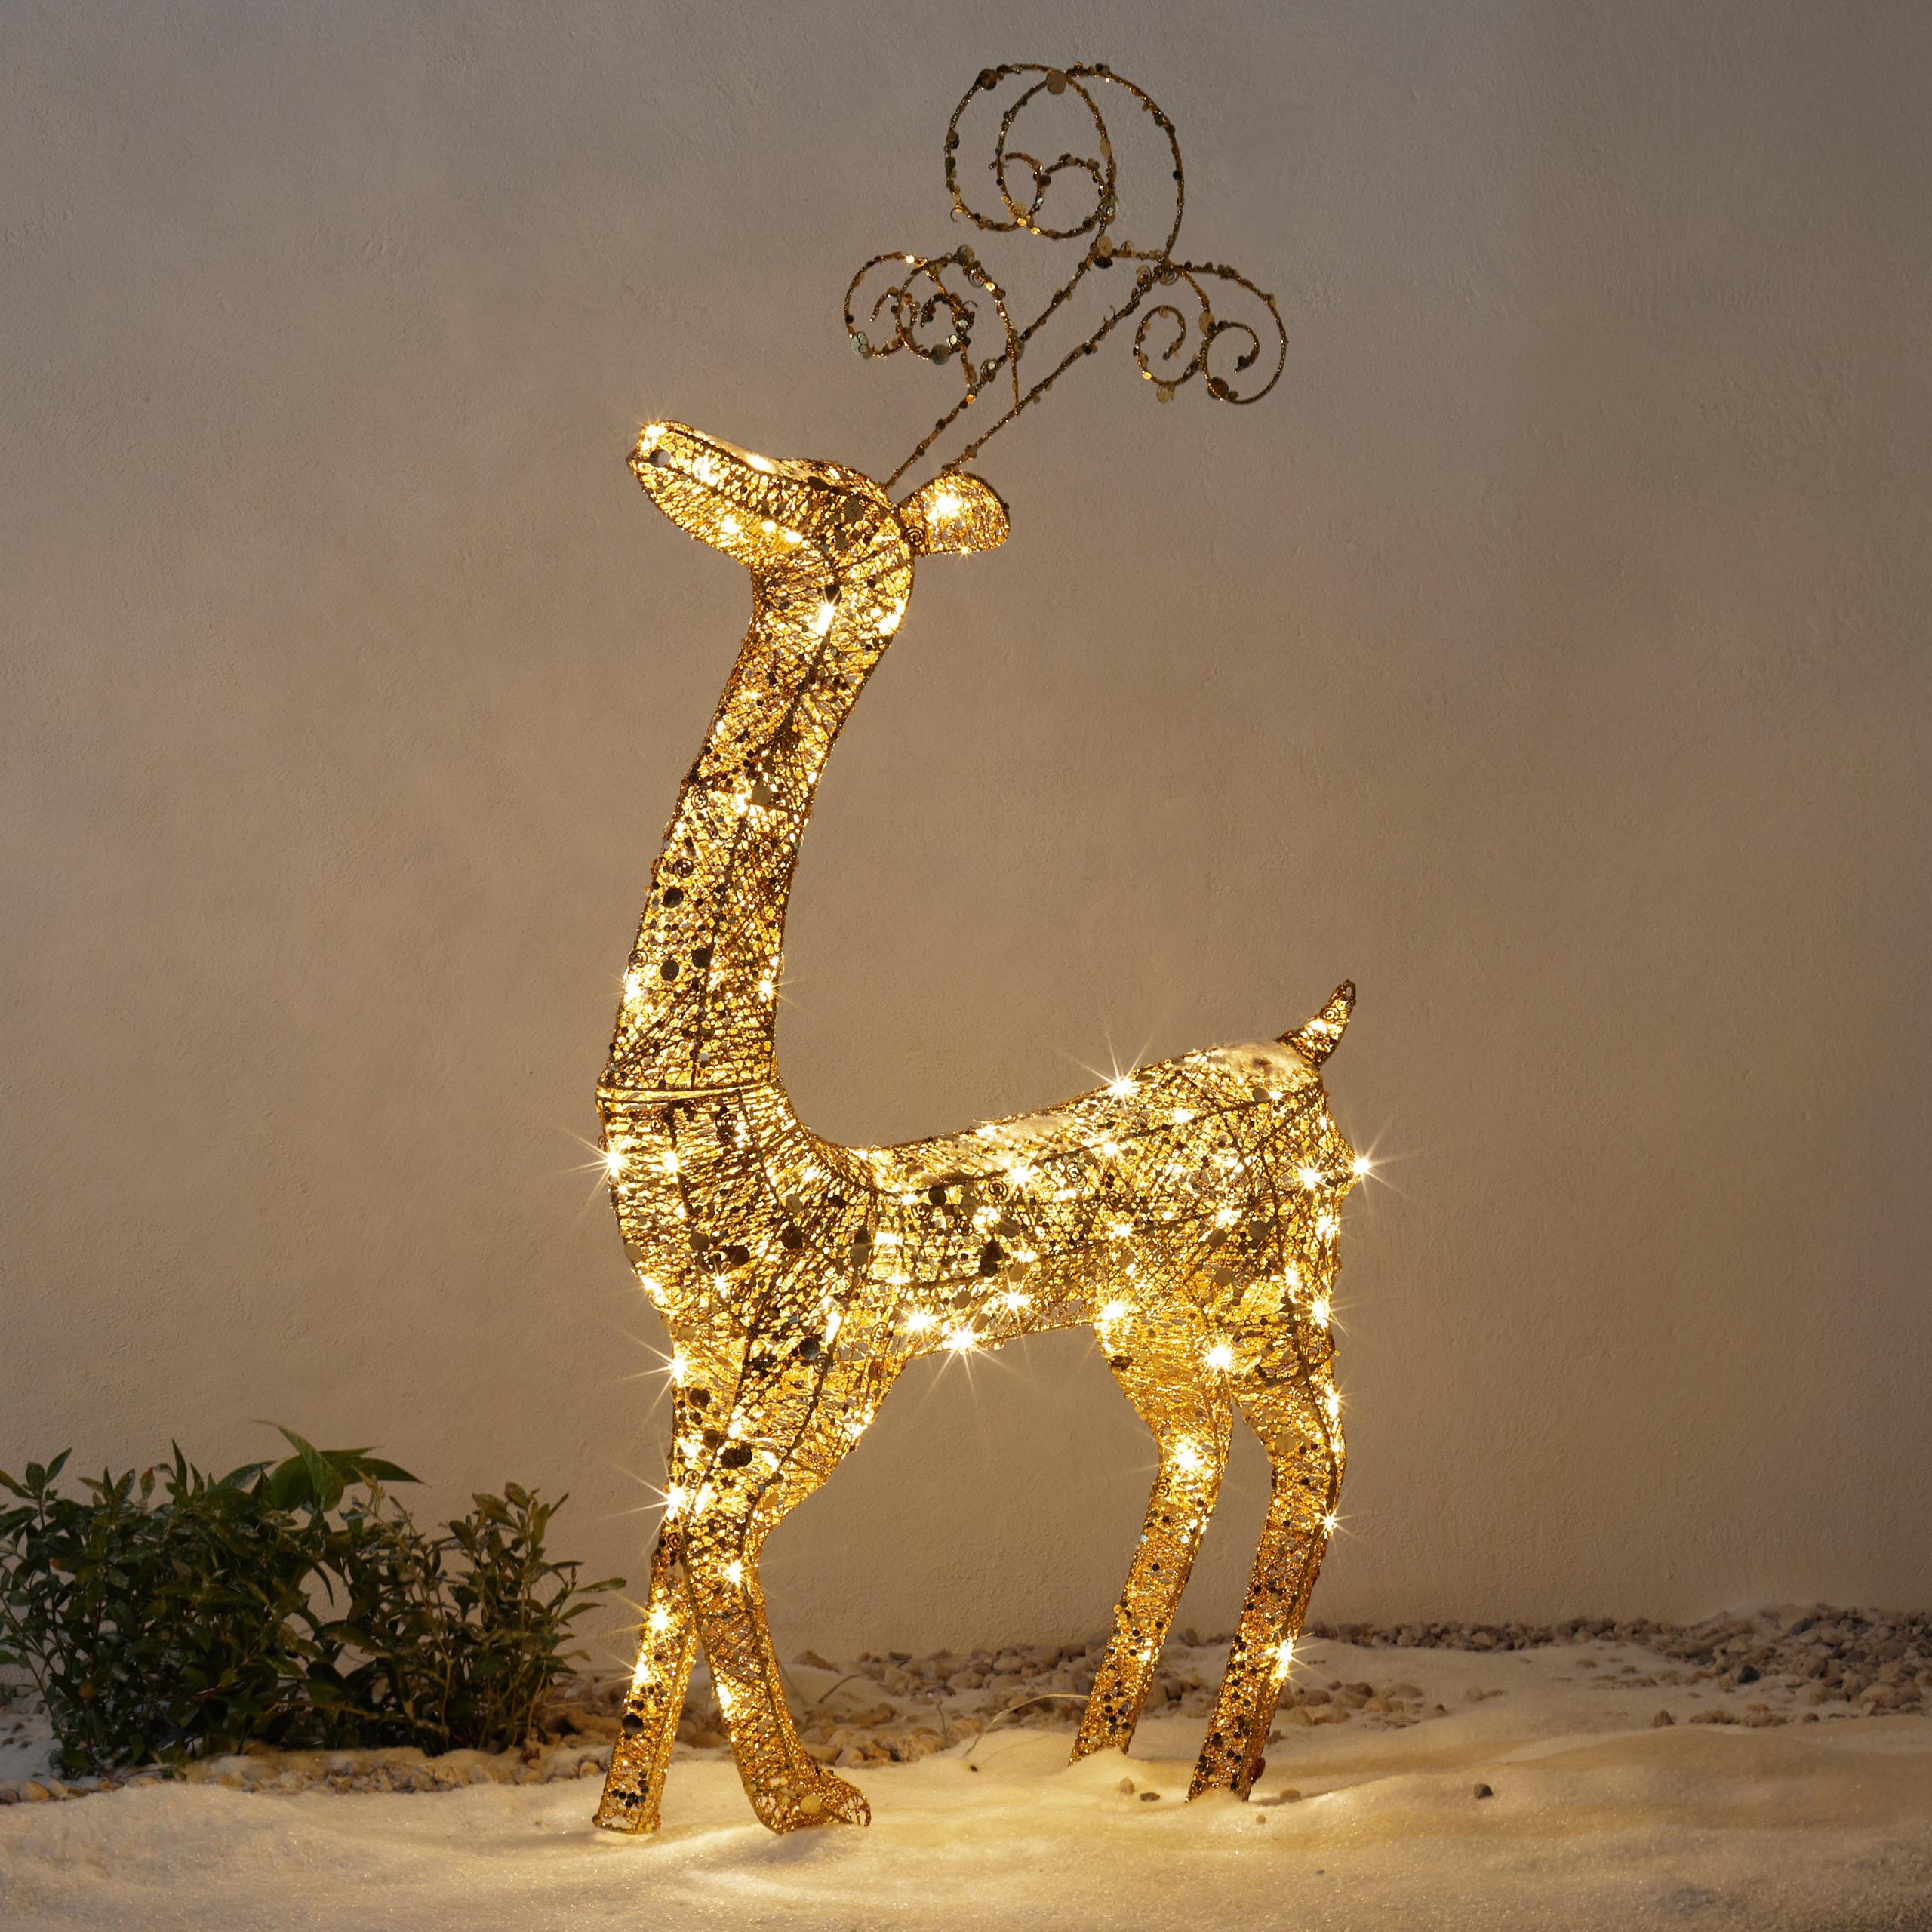 *For X-Mas*: LED-Rentier aus Kunststoff, stehend, gold, groß